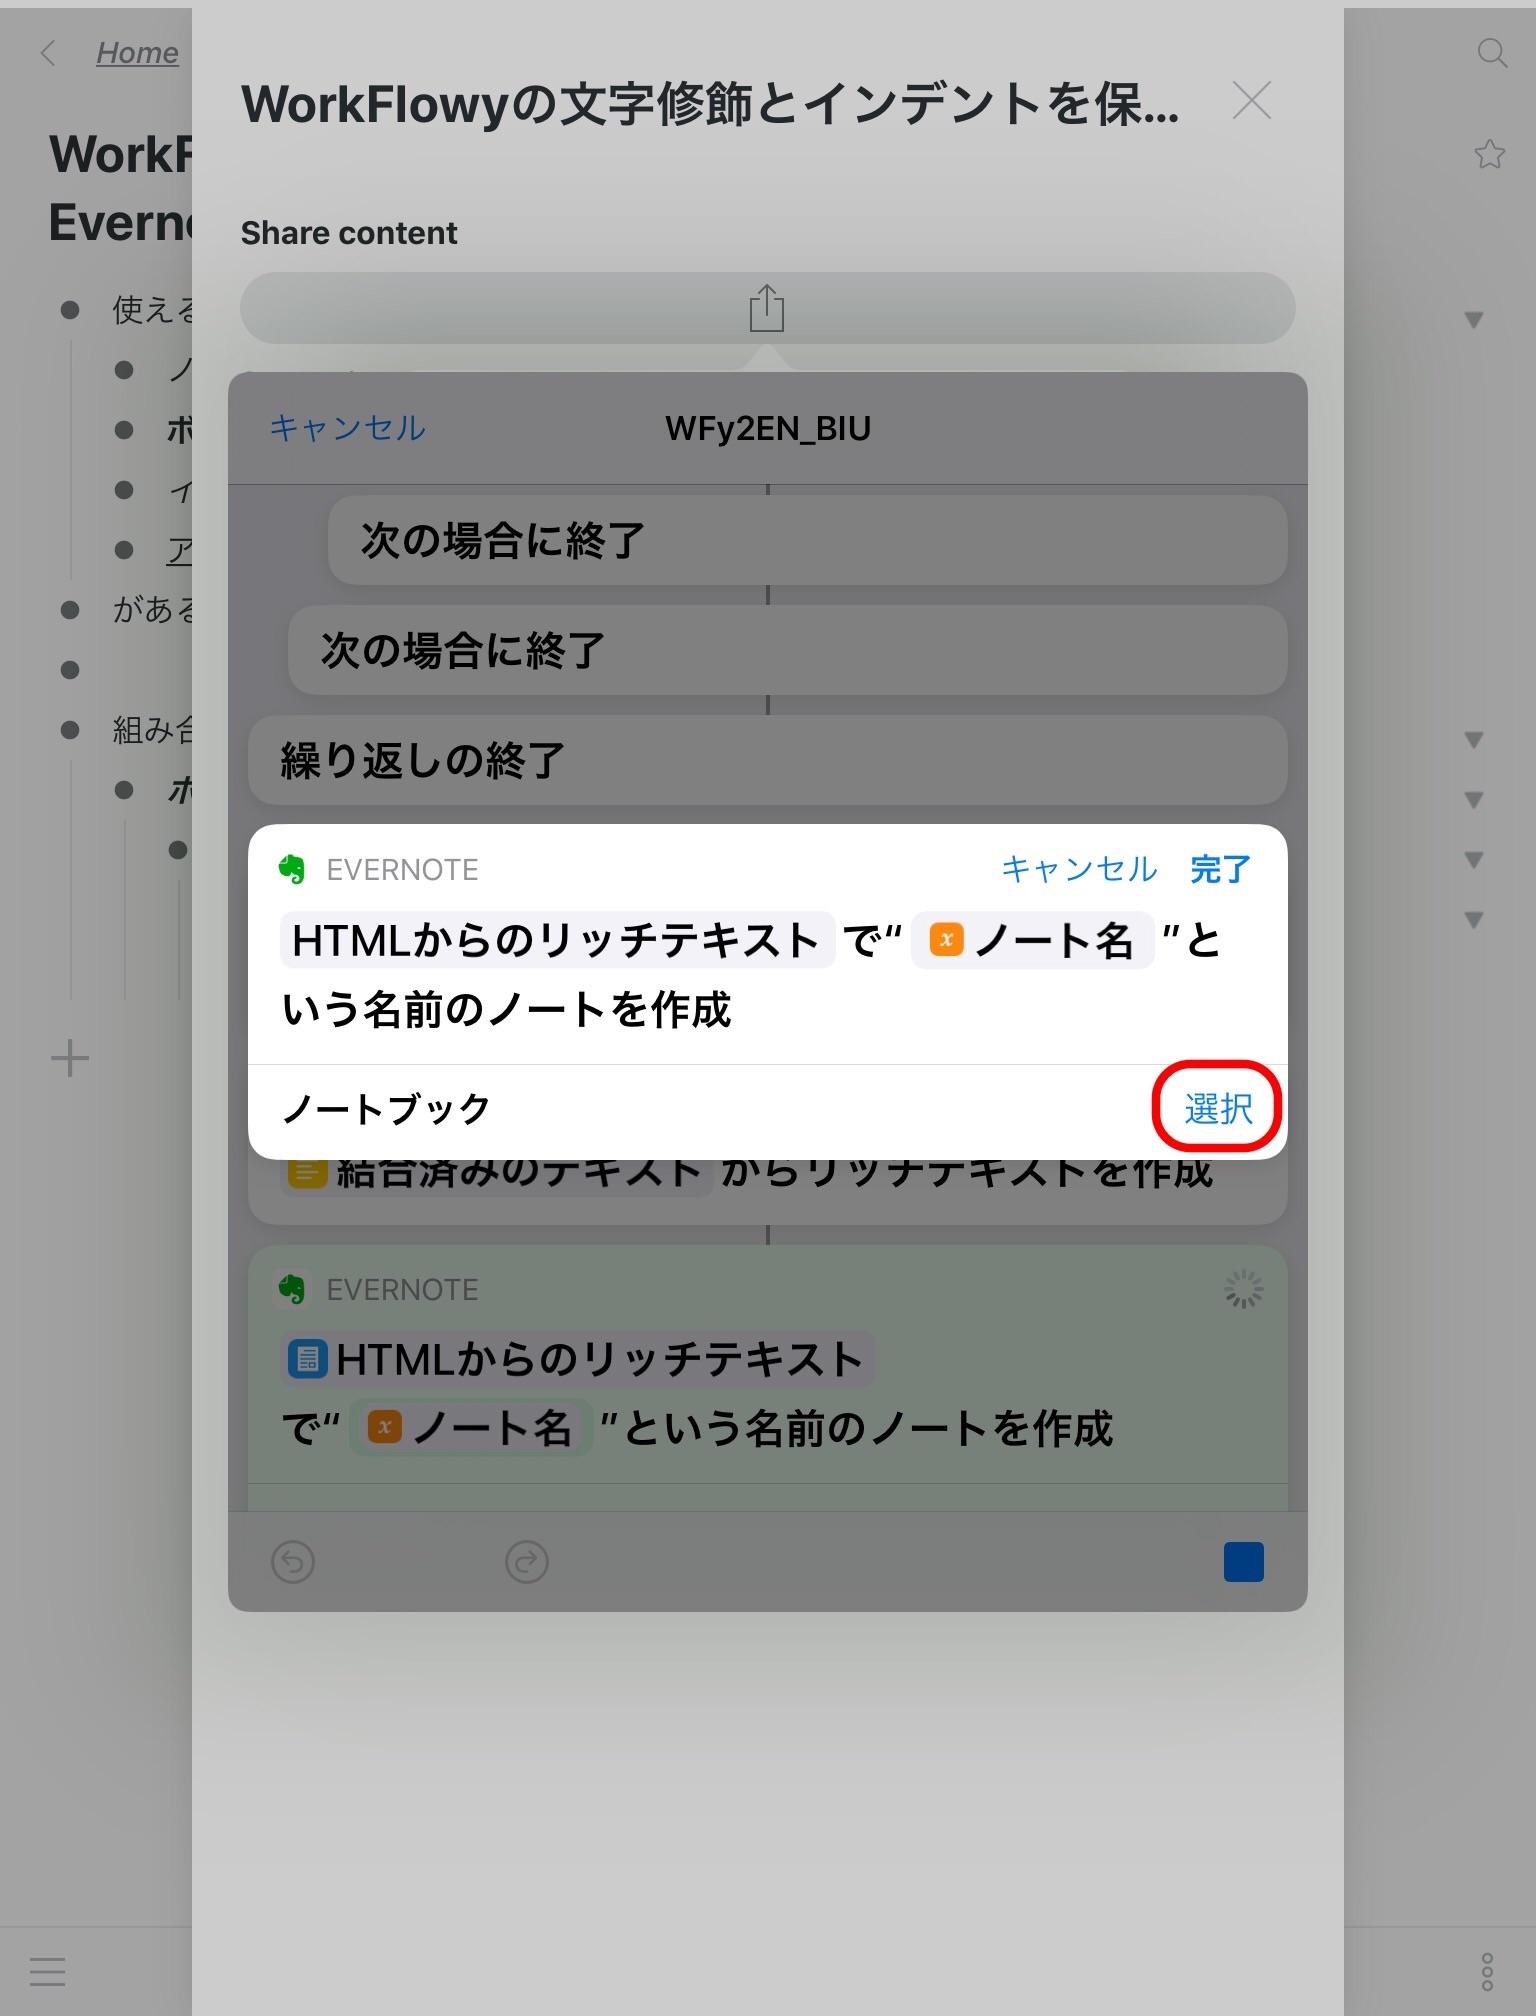 f:id:sorashima:20200731233246j:plain:w637